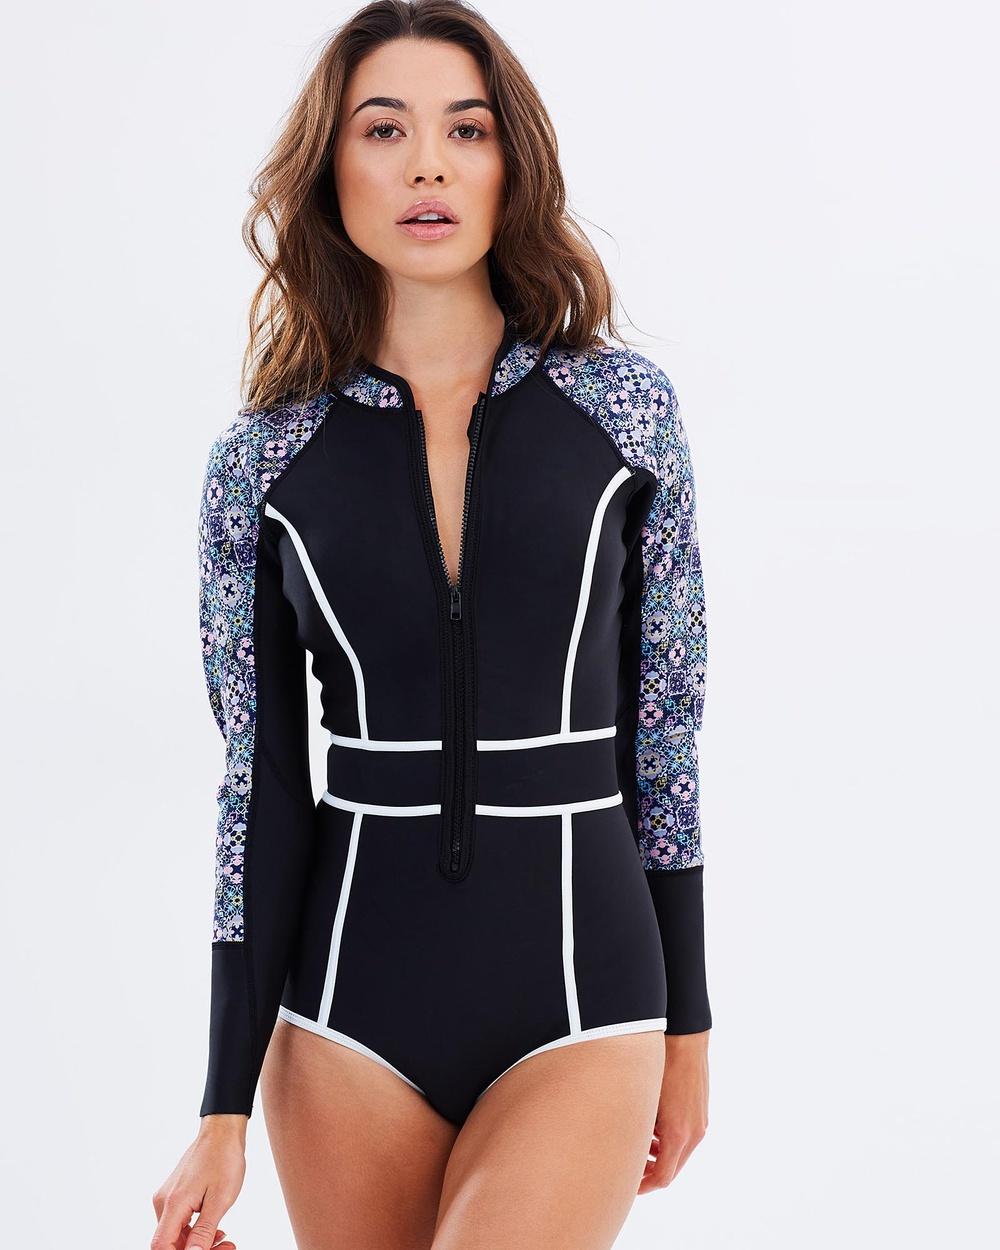 Duskii Waikiki Nights Long Sleeve Bikini Suit One-Piece / Swimsuit Tile Waikiki Nights Long Sleeve Bikini Suit